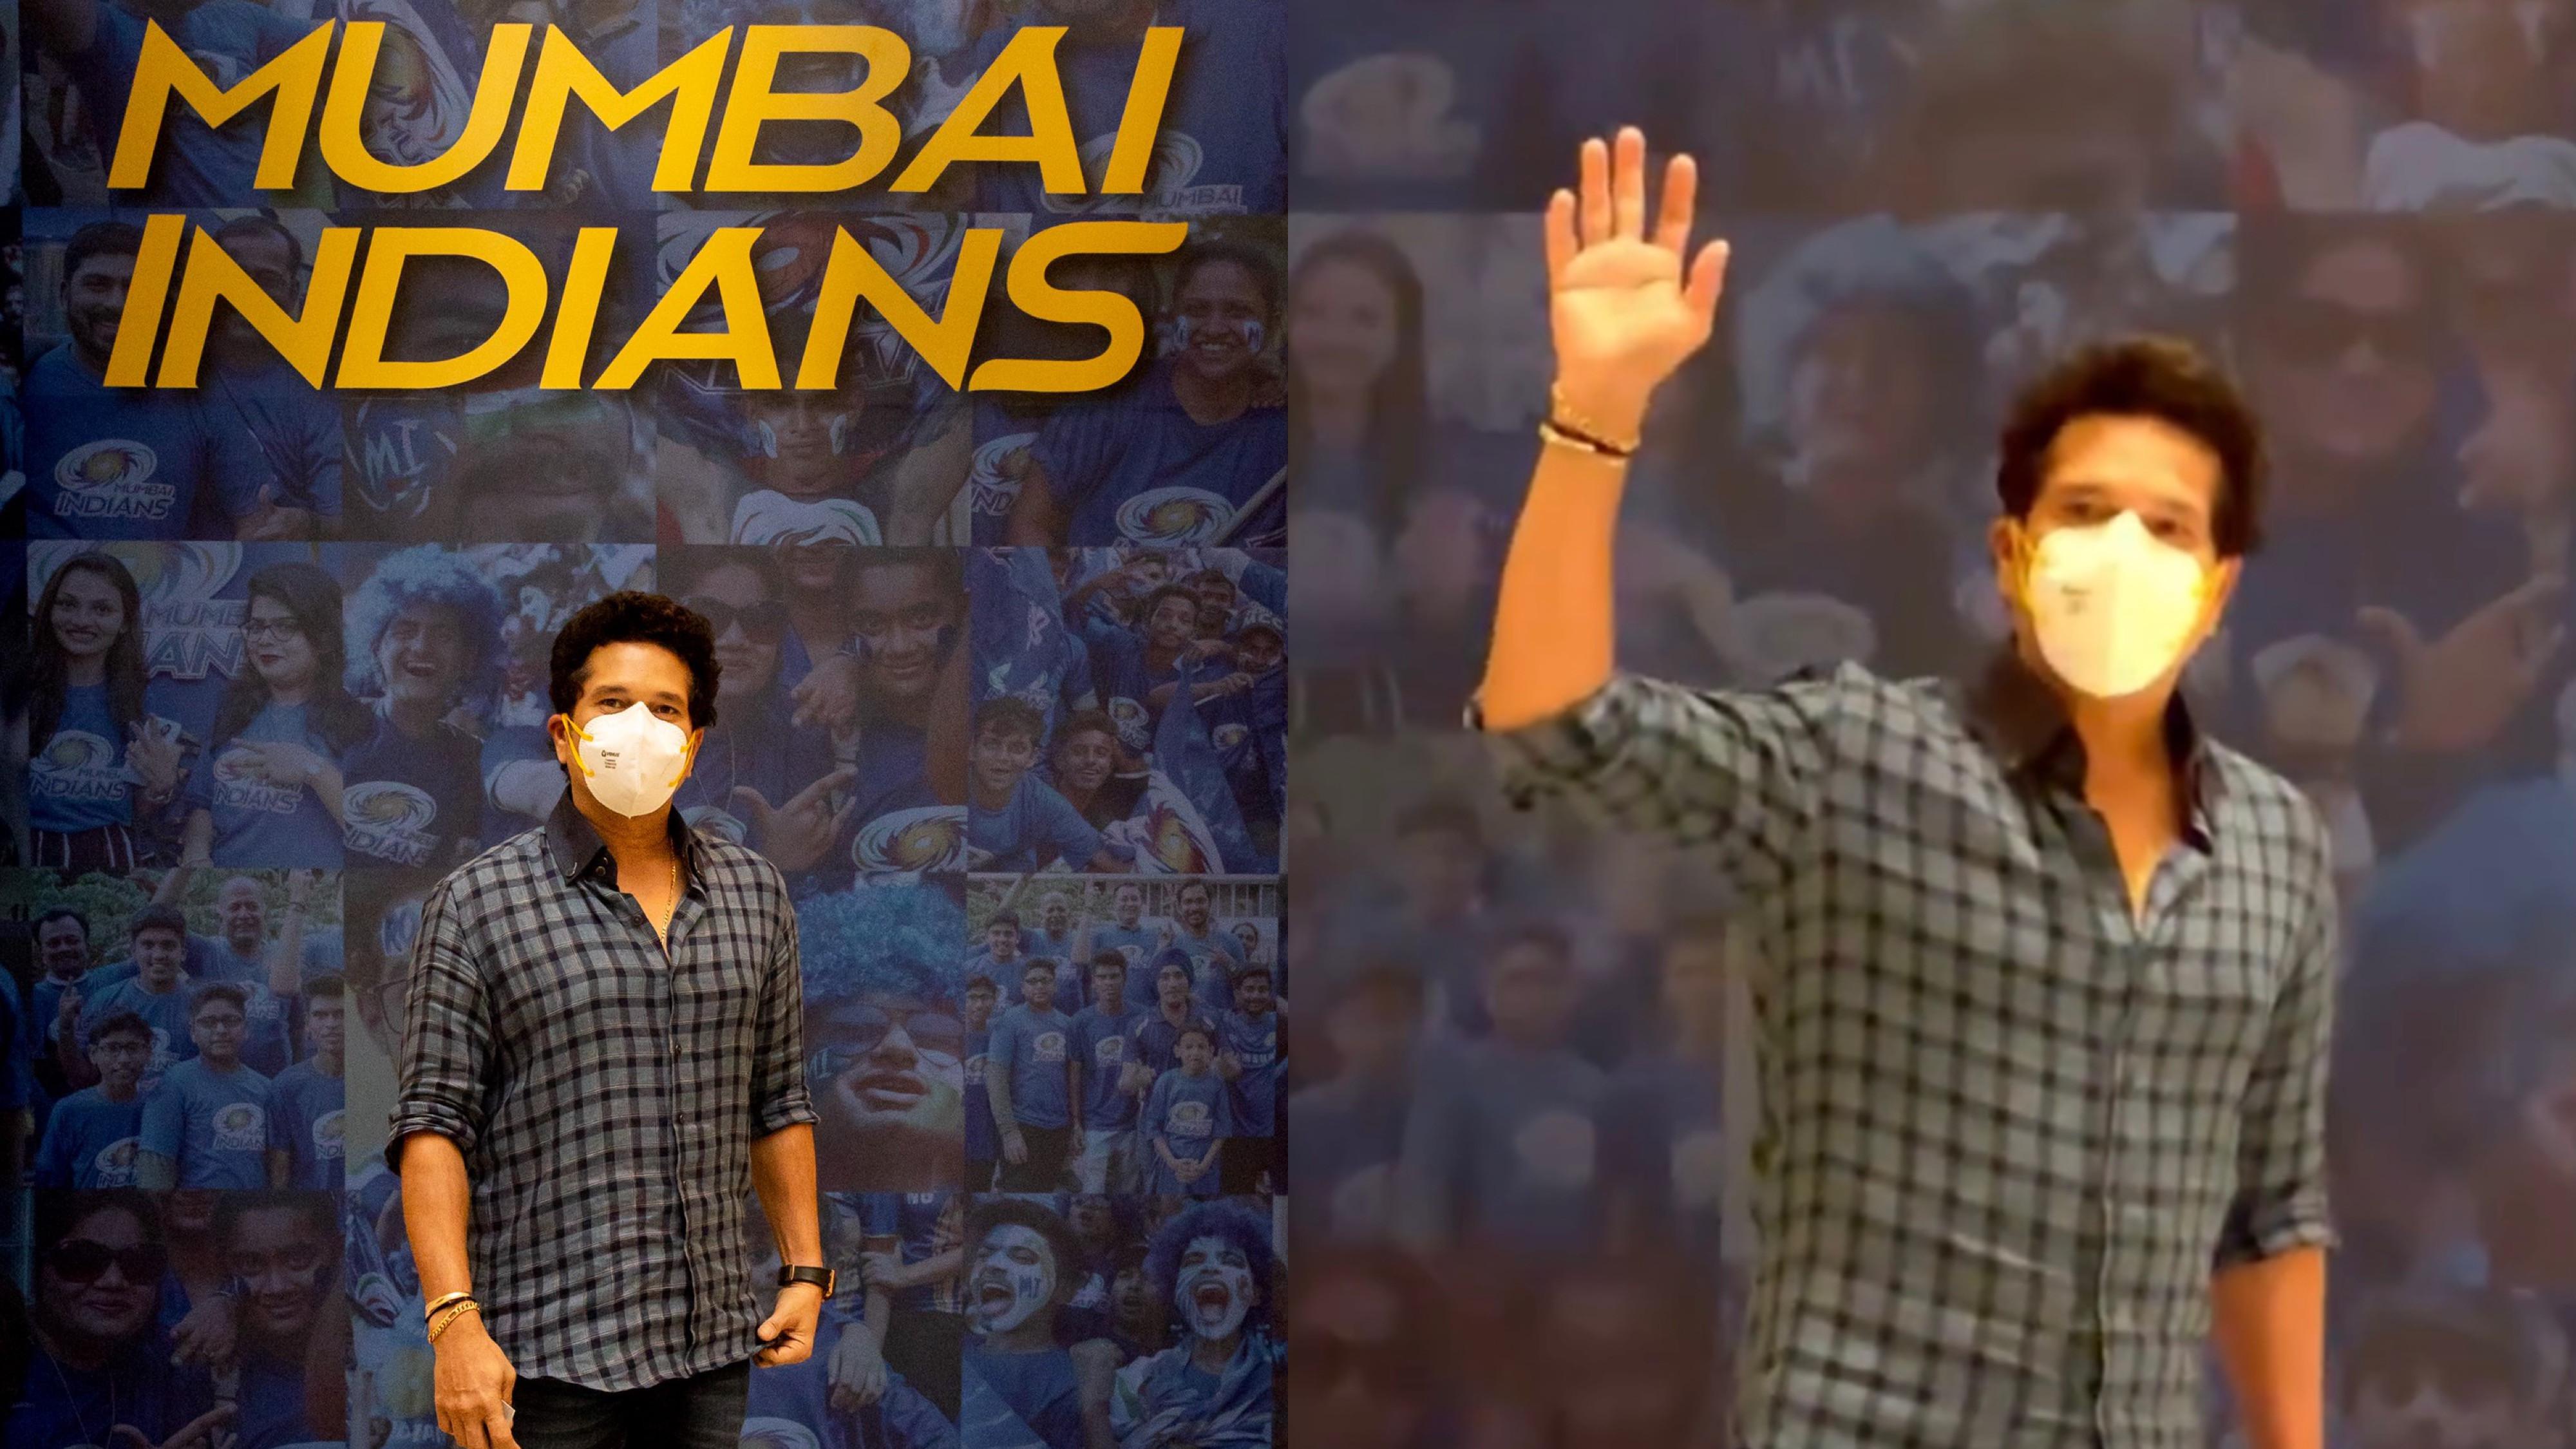 IPL 2021: WATCH - Mumbai Indians mentor Sachin Tendulkar arrives in Abu Dhabi